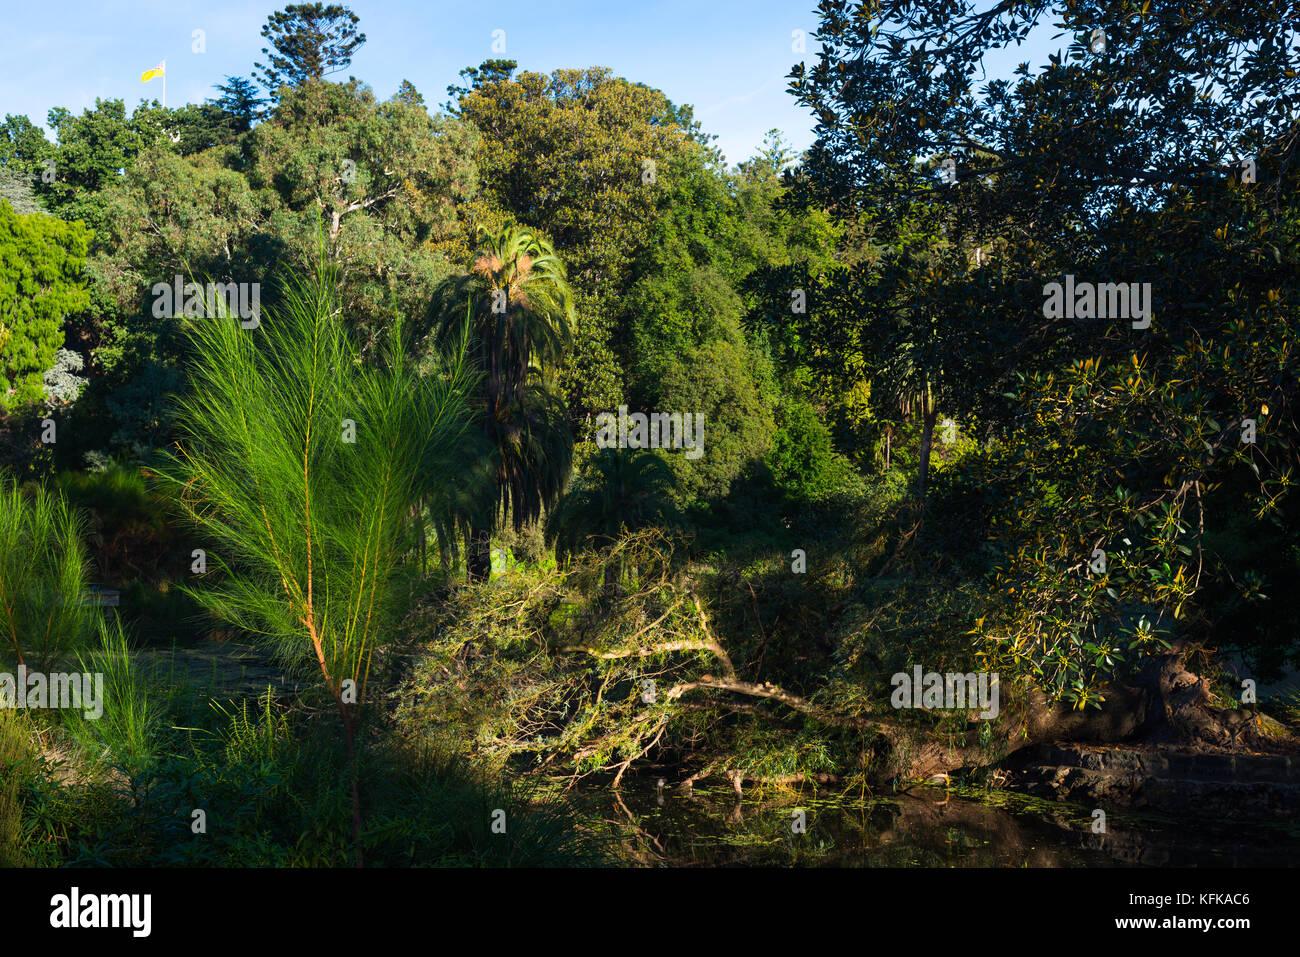 The Royal botanic gardens, Melbourne, Australia - Stock Image